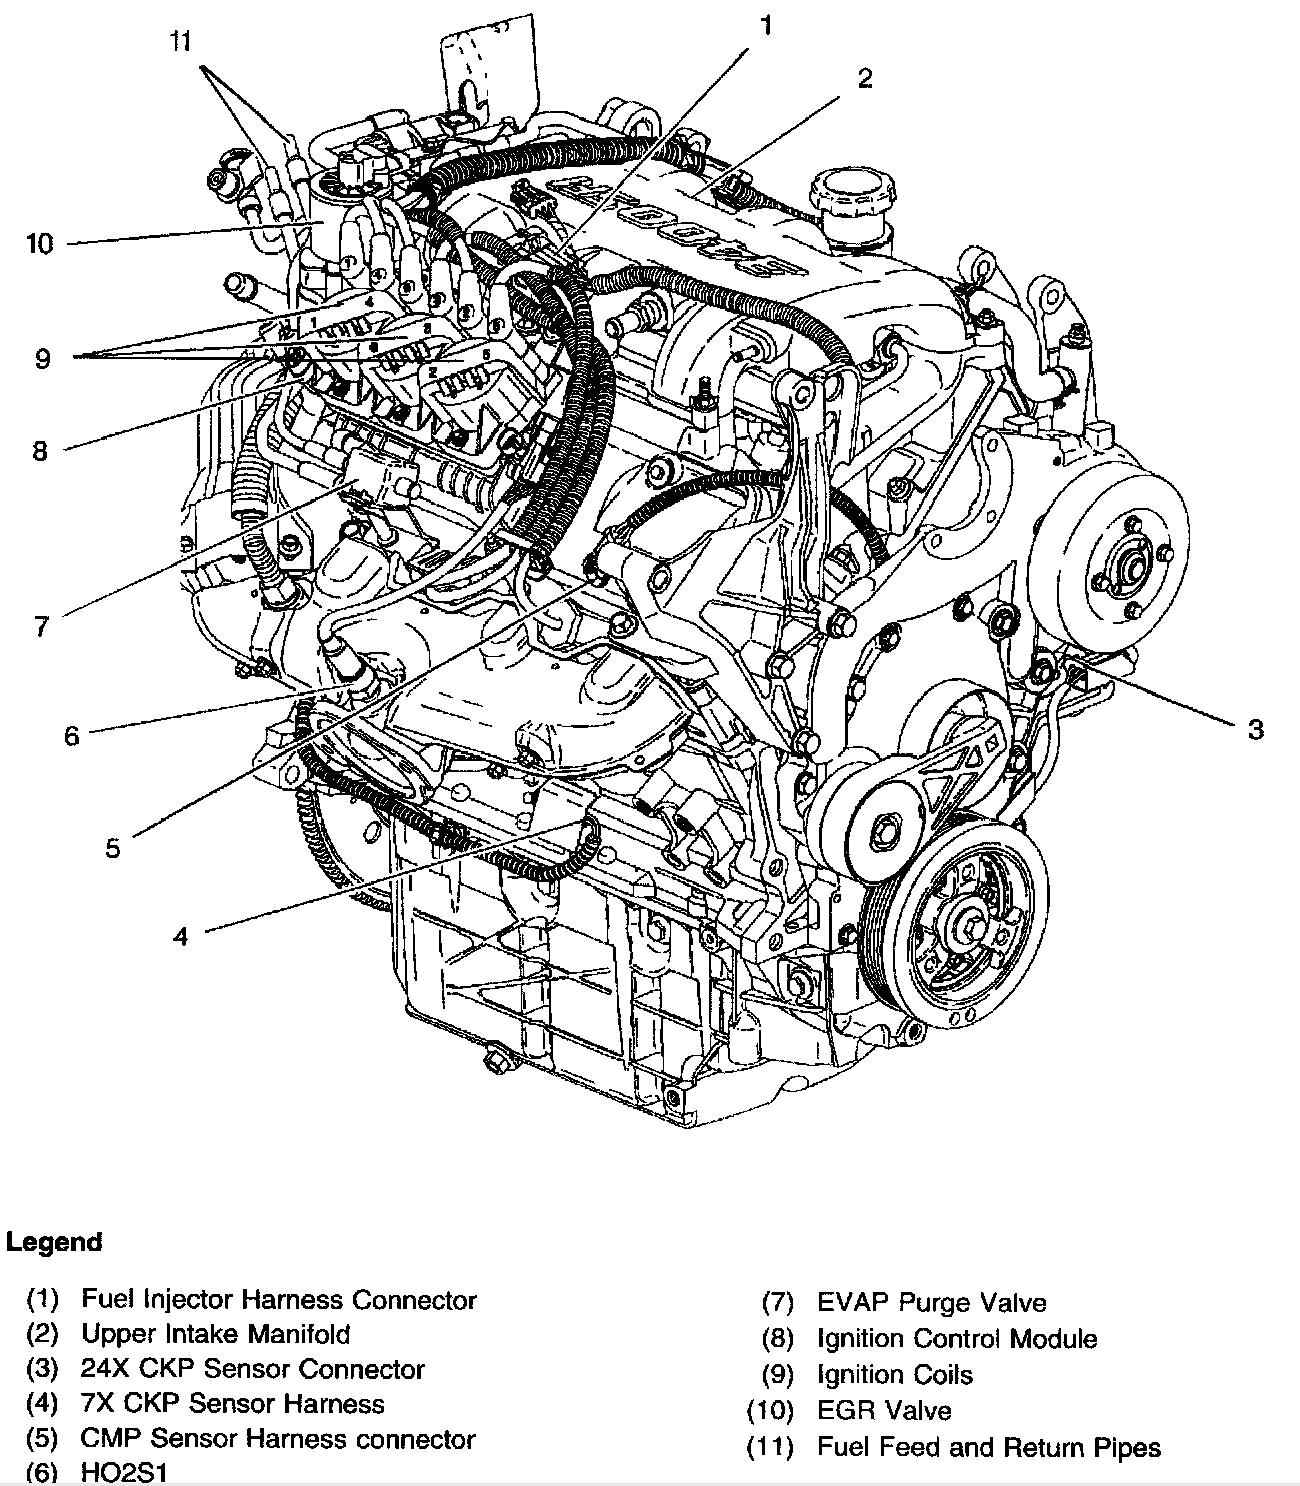 diagram of gm v6 engine - wiring diagram export deep-bitter -  deep-bitter.congressosifo2018.it  congressosifo2018.it